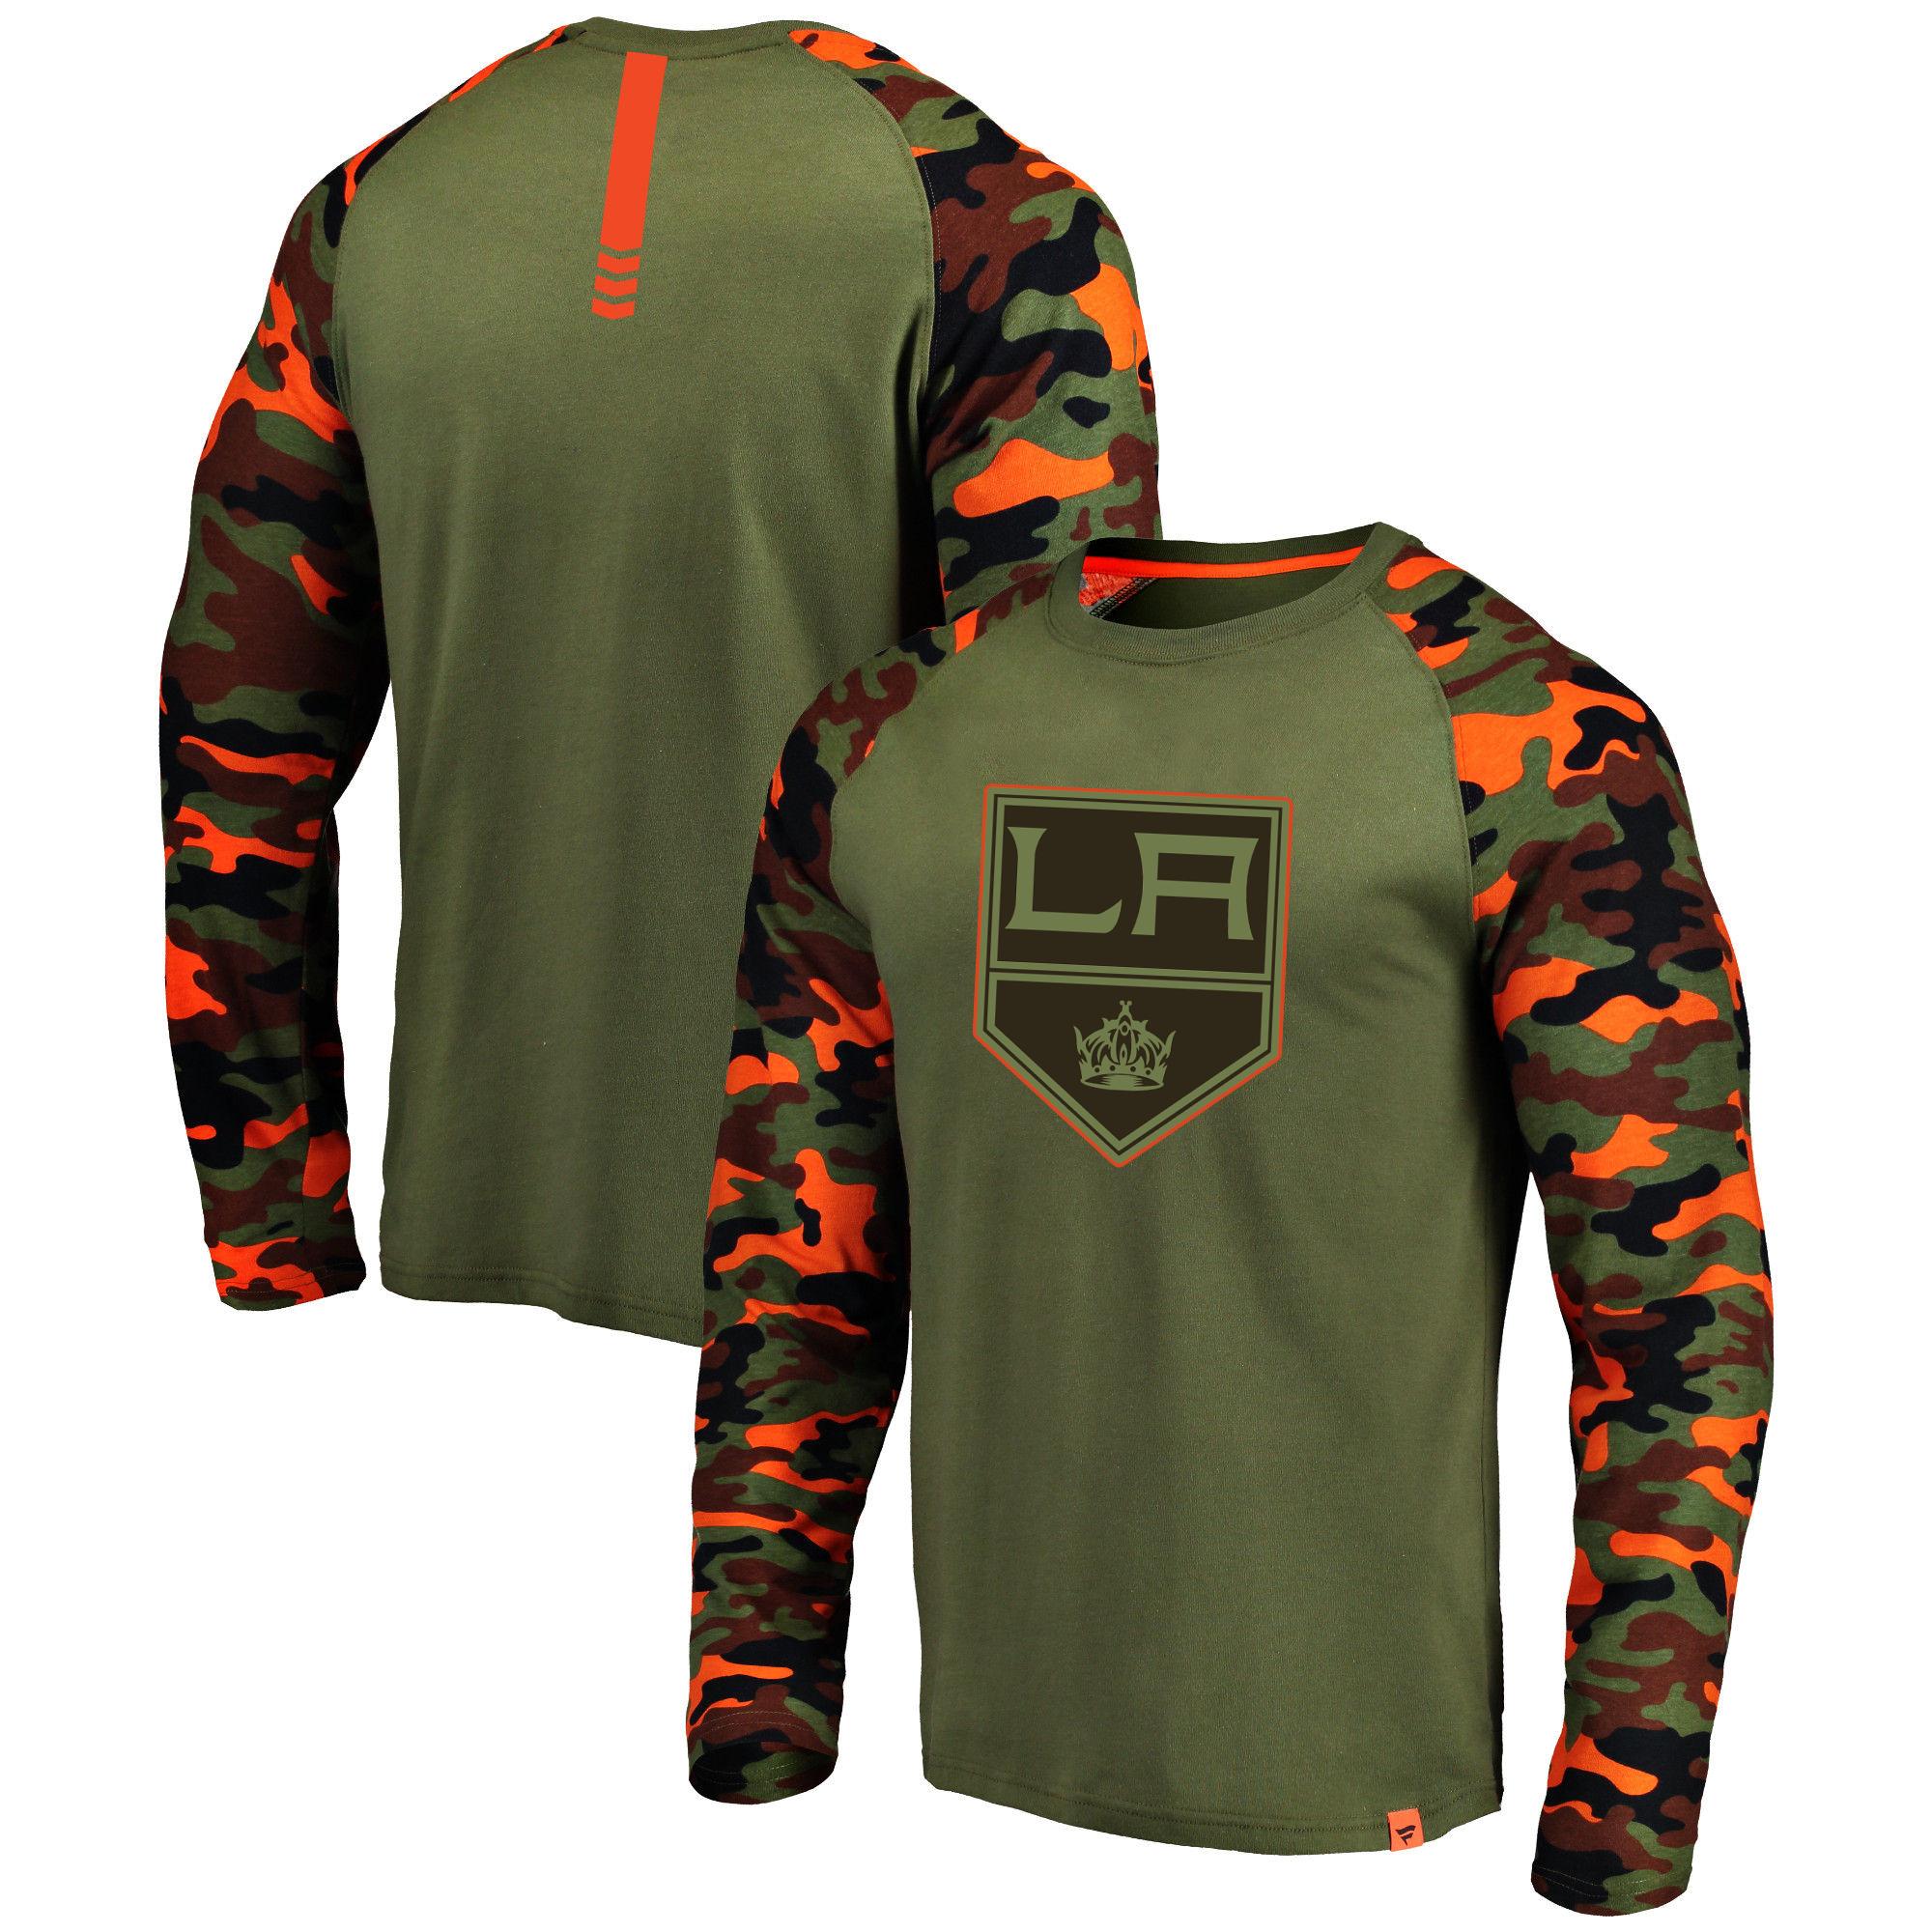 Los Angeles Kings Fanatics Braned Olive/Camo Recon Long Sleeve Raglan T-Shirt